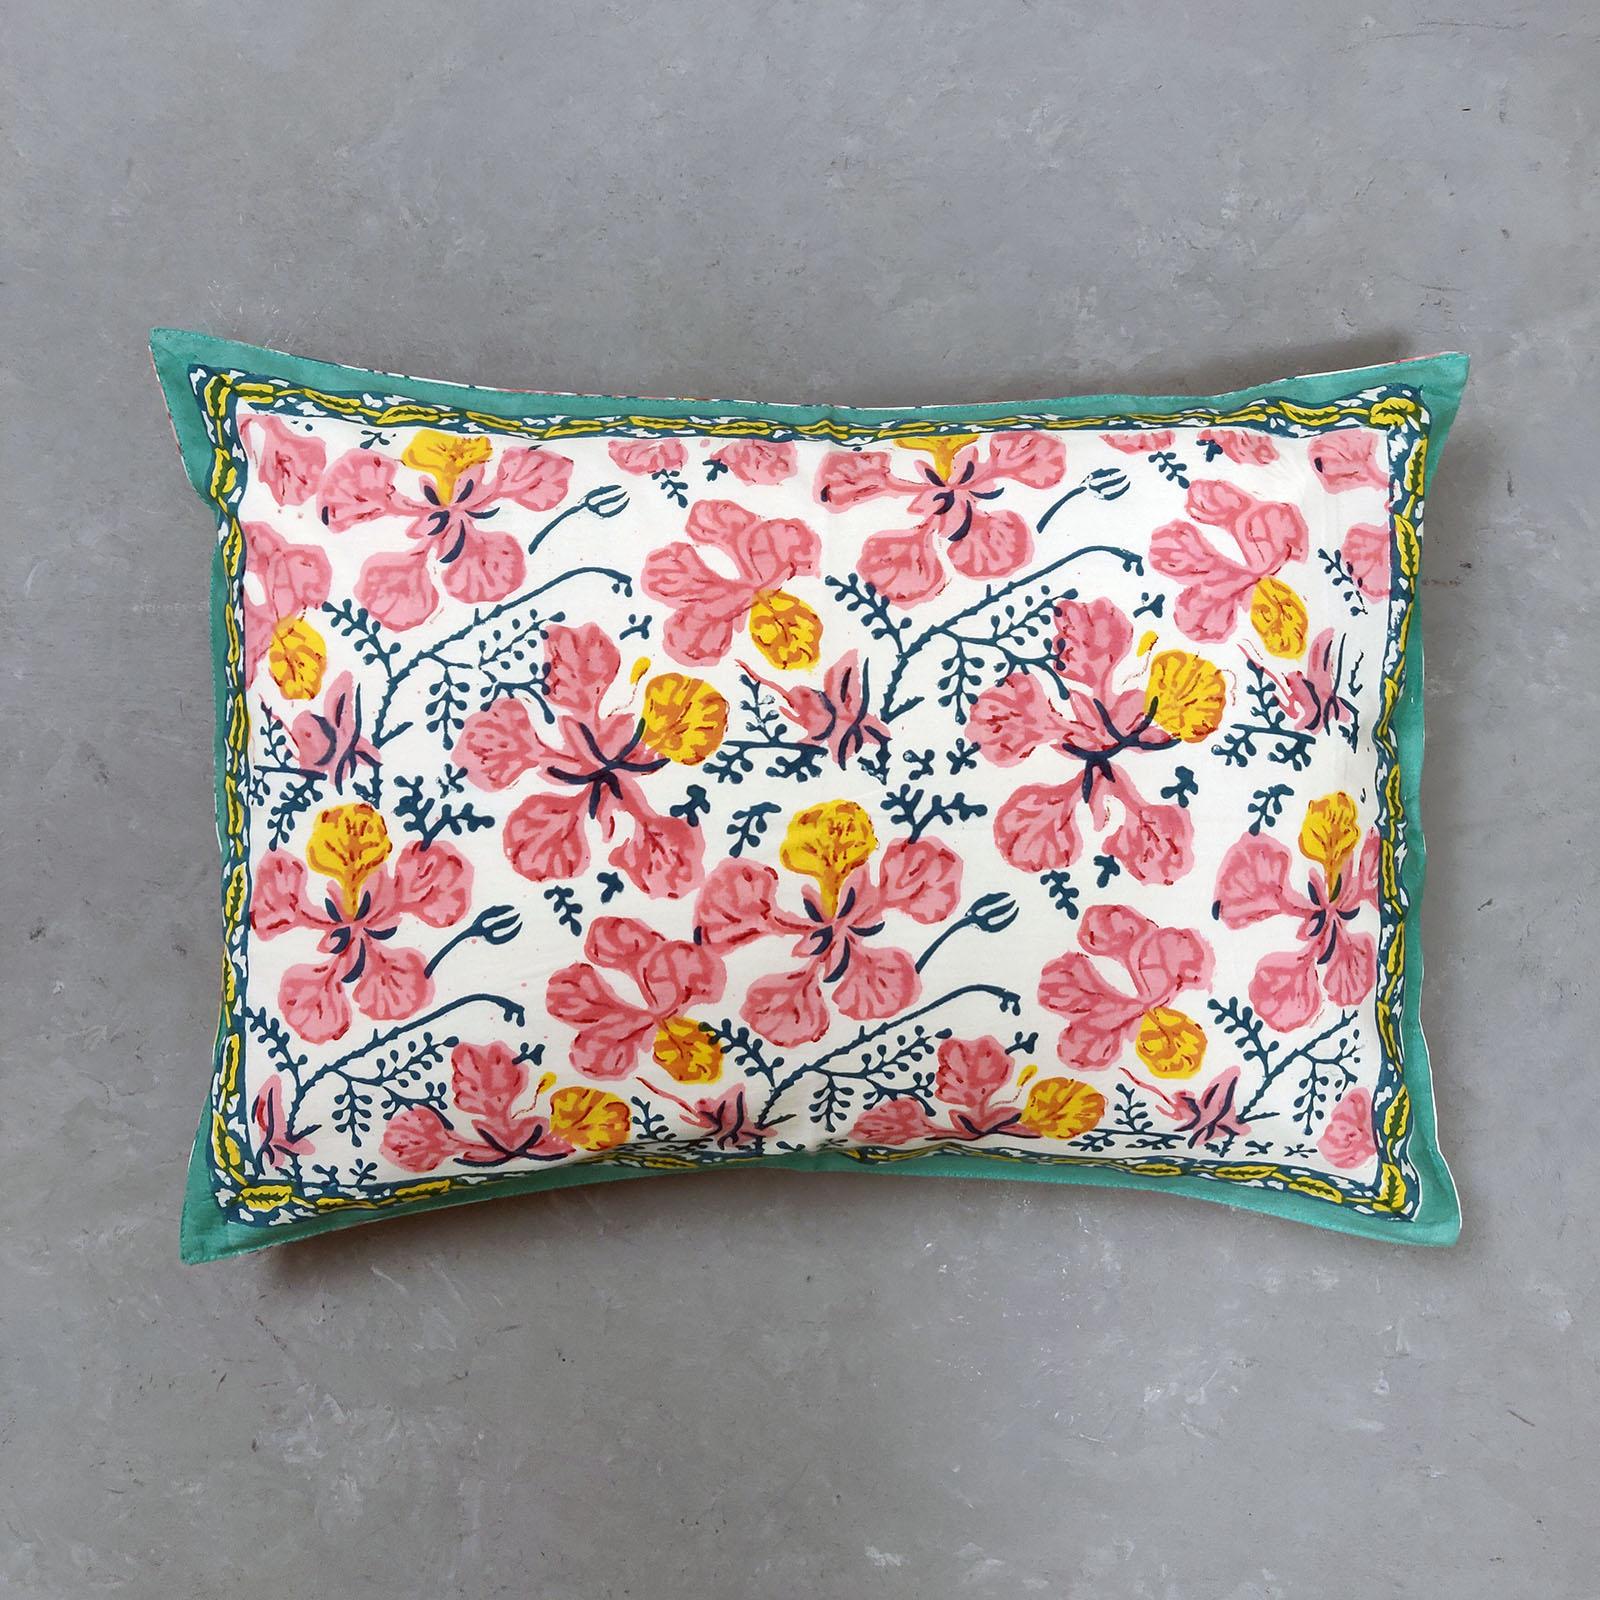 Avasa Pillow Cover